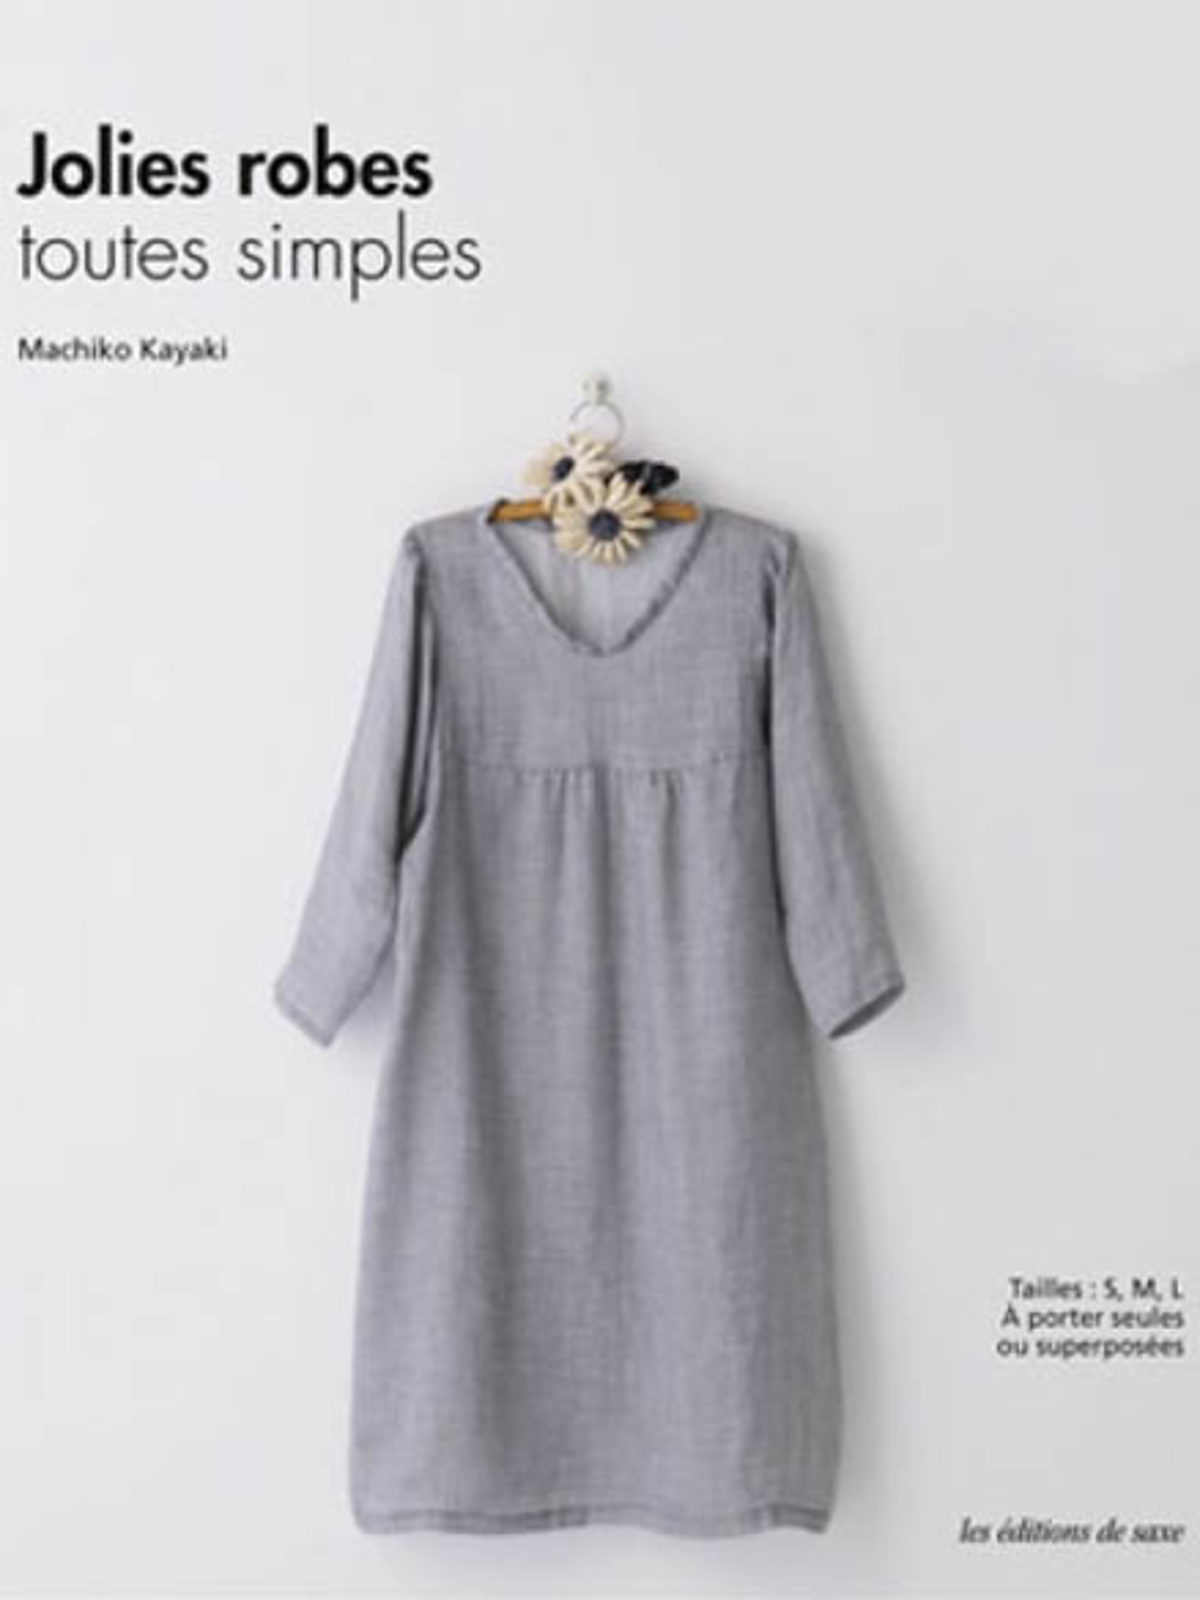 jolies robes toutes simples